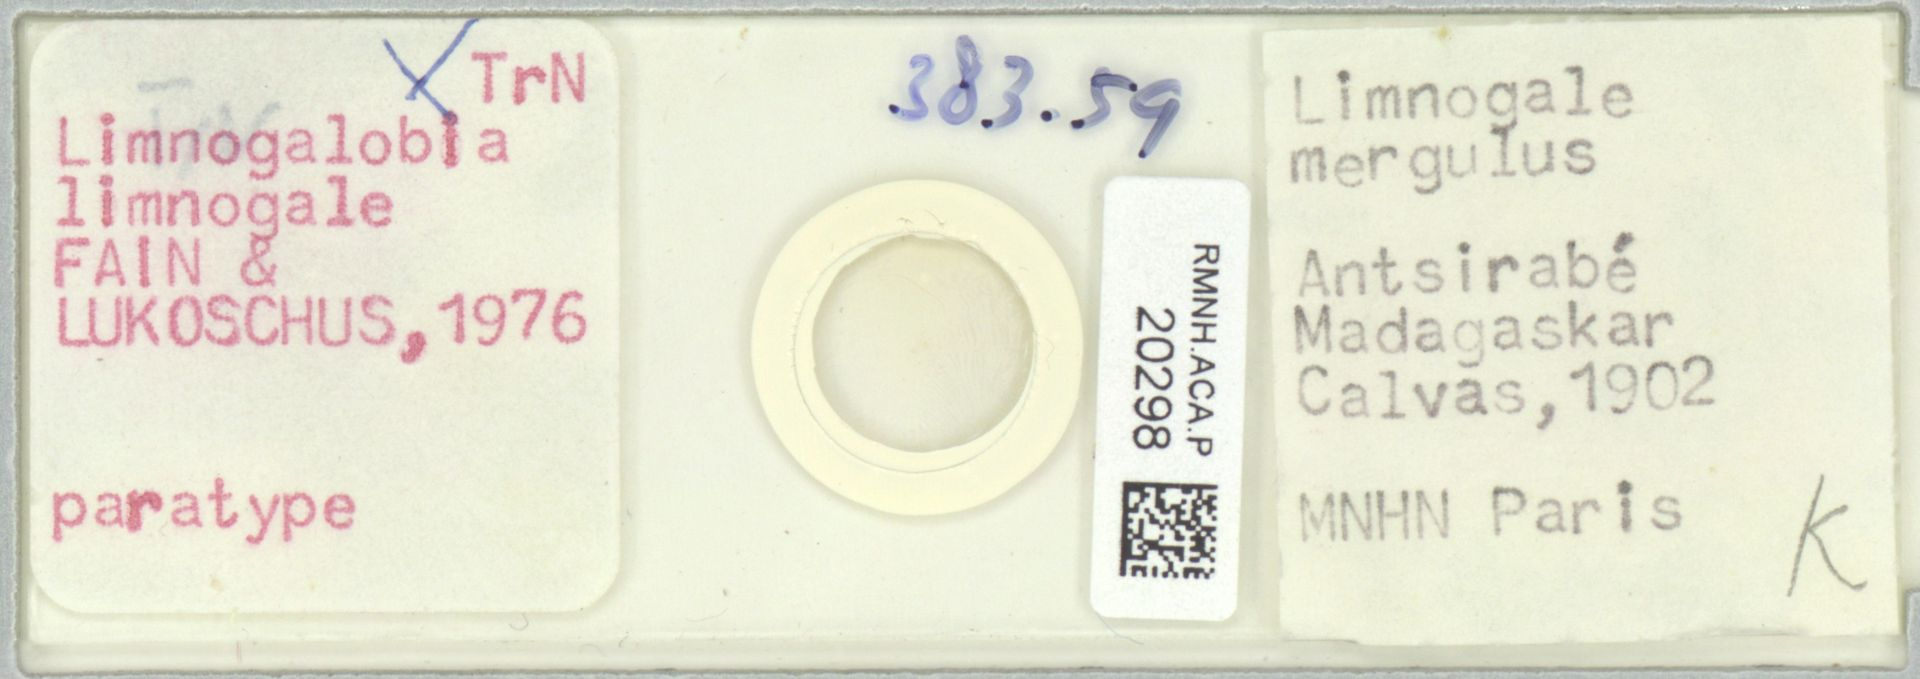 RMNH.ACA.P.20298 | Limnogalobia limnogale